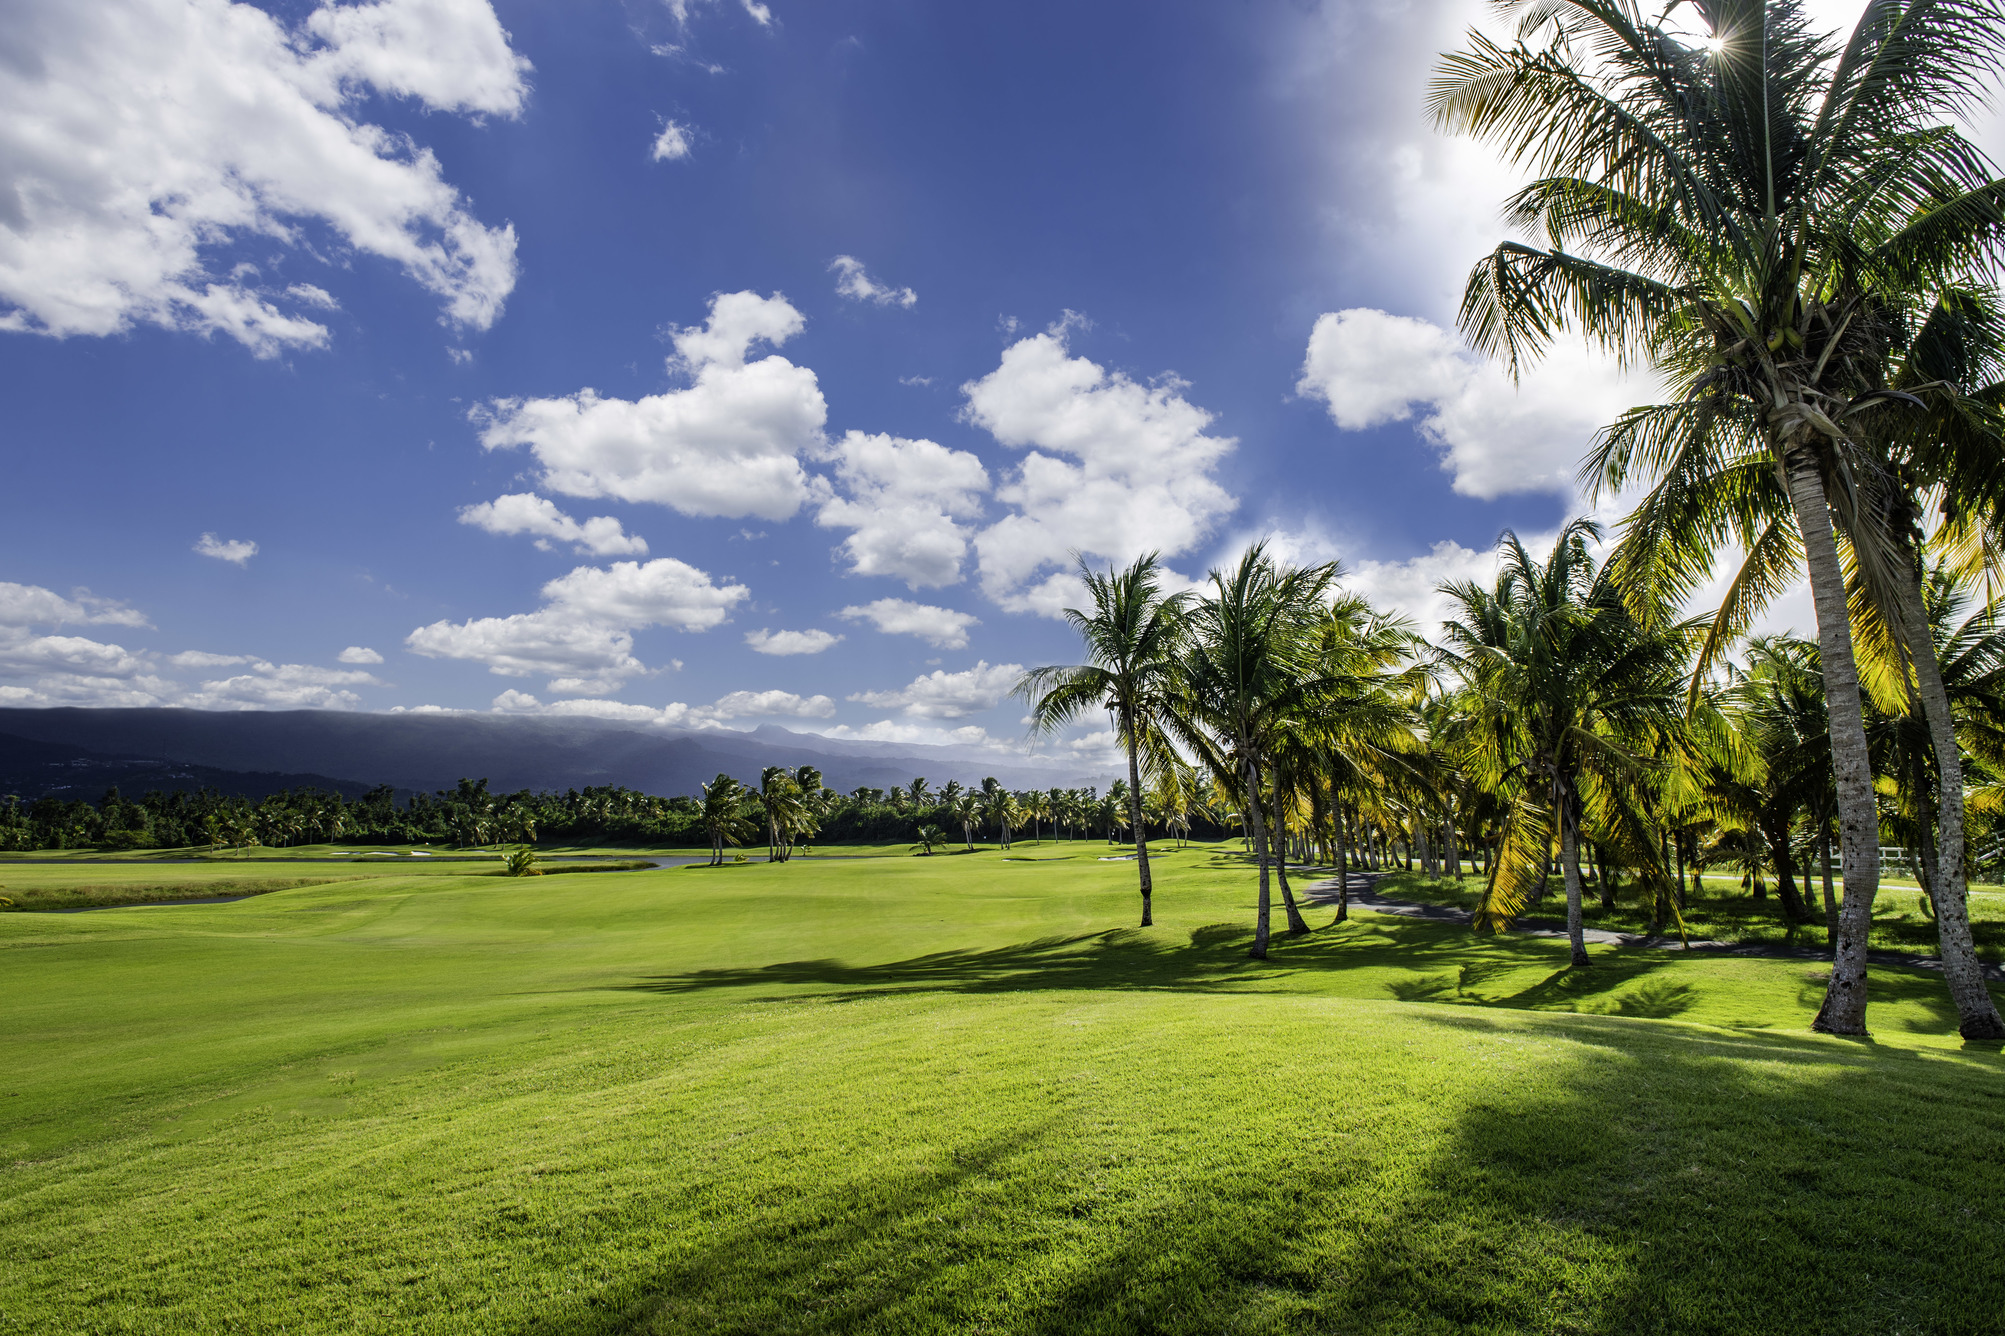 golf course, golf, island, Caribbean